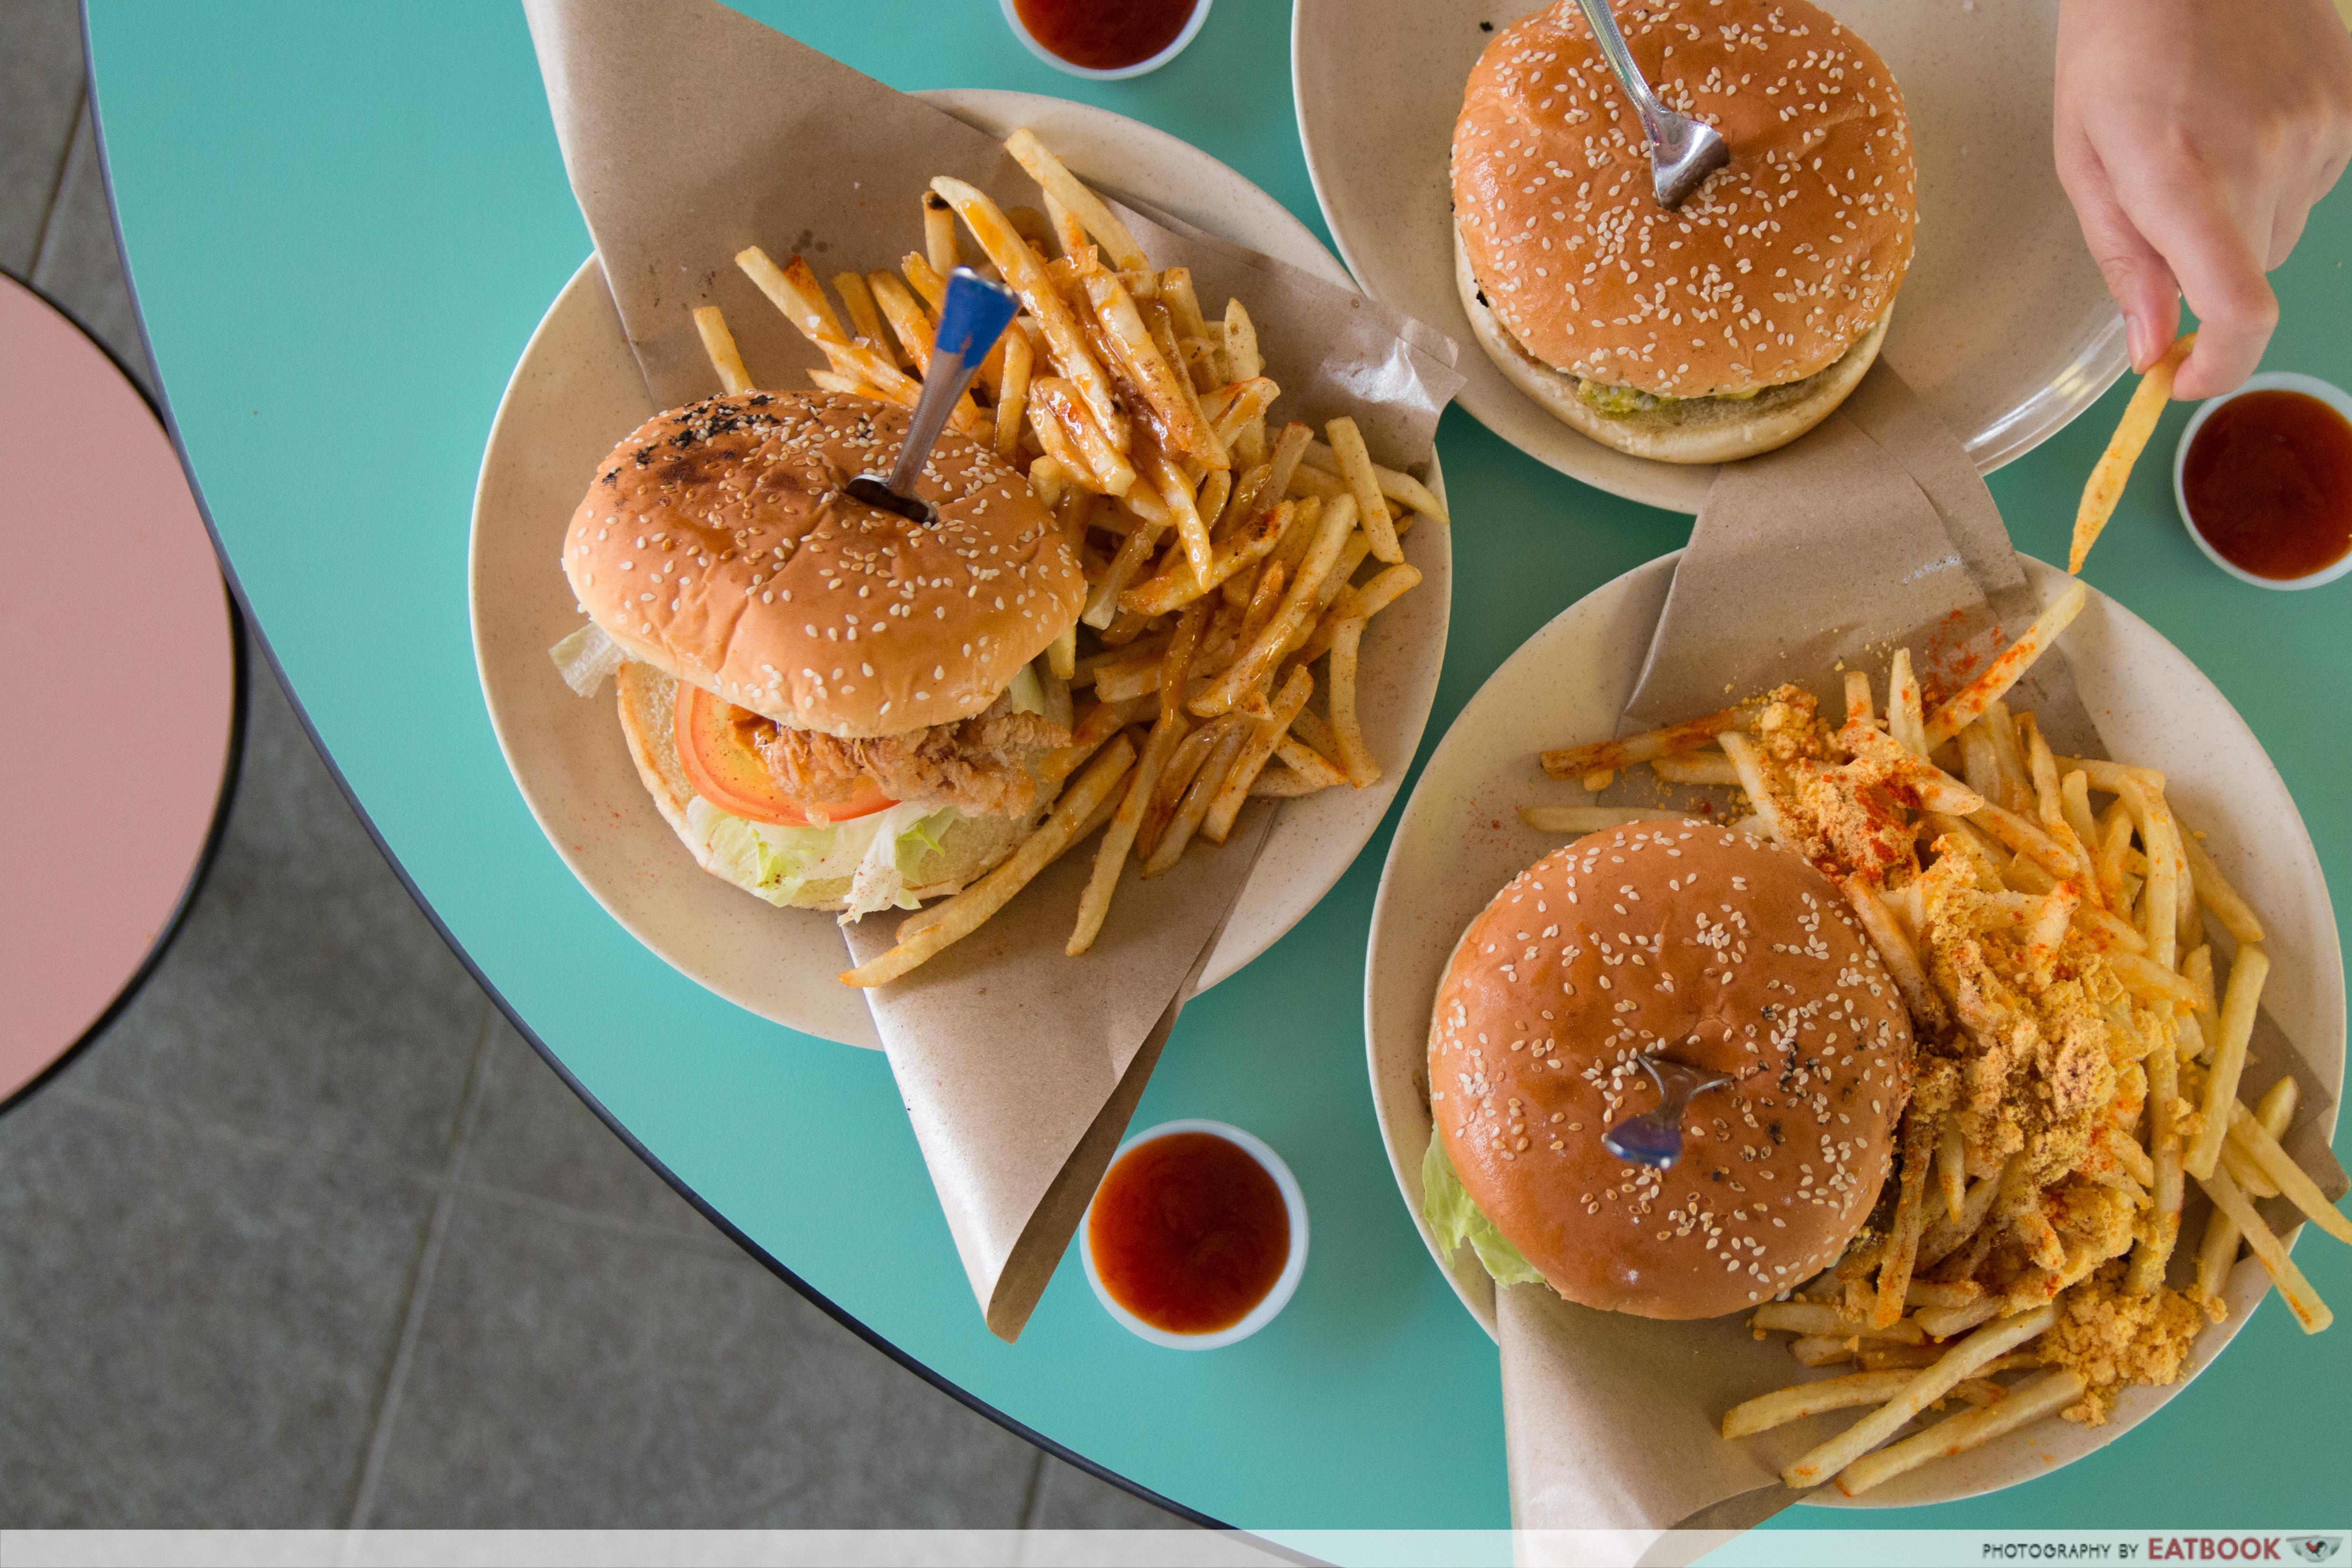 I Love Burger Lah! - Flatlay